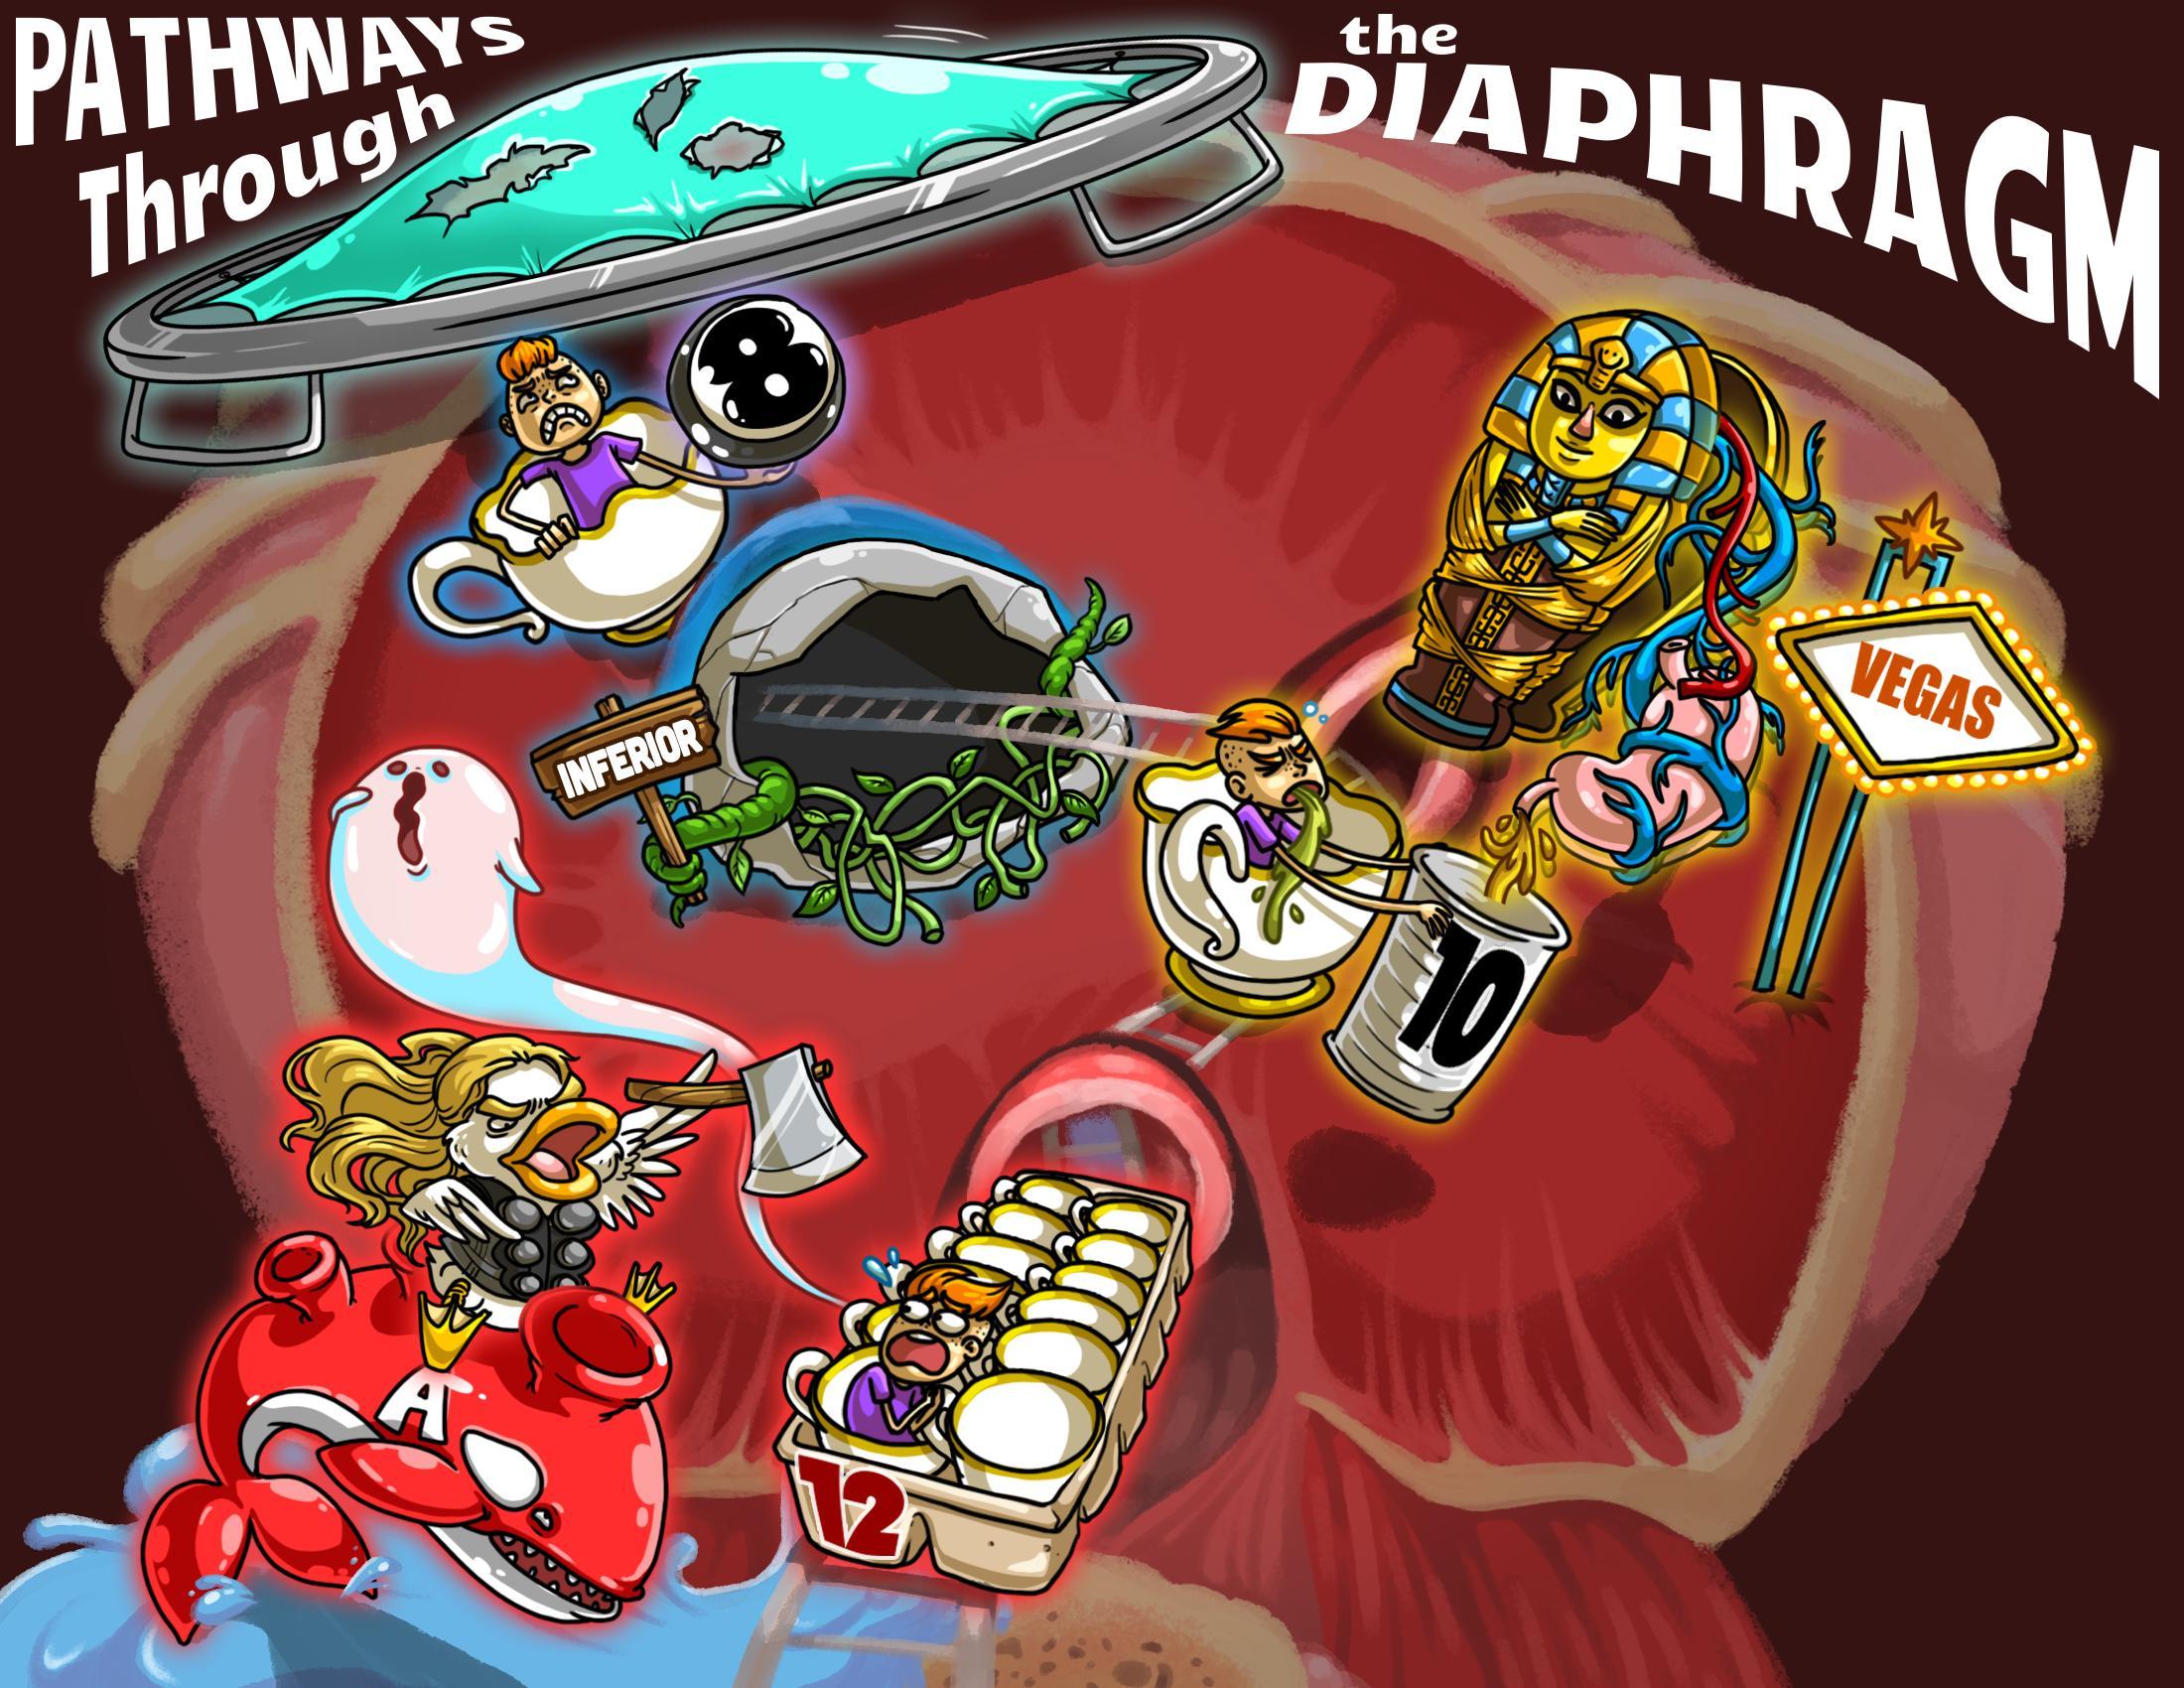 Pathways through the Diaphragm